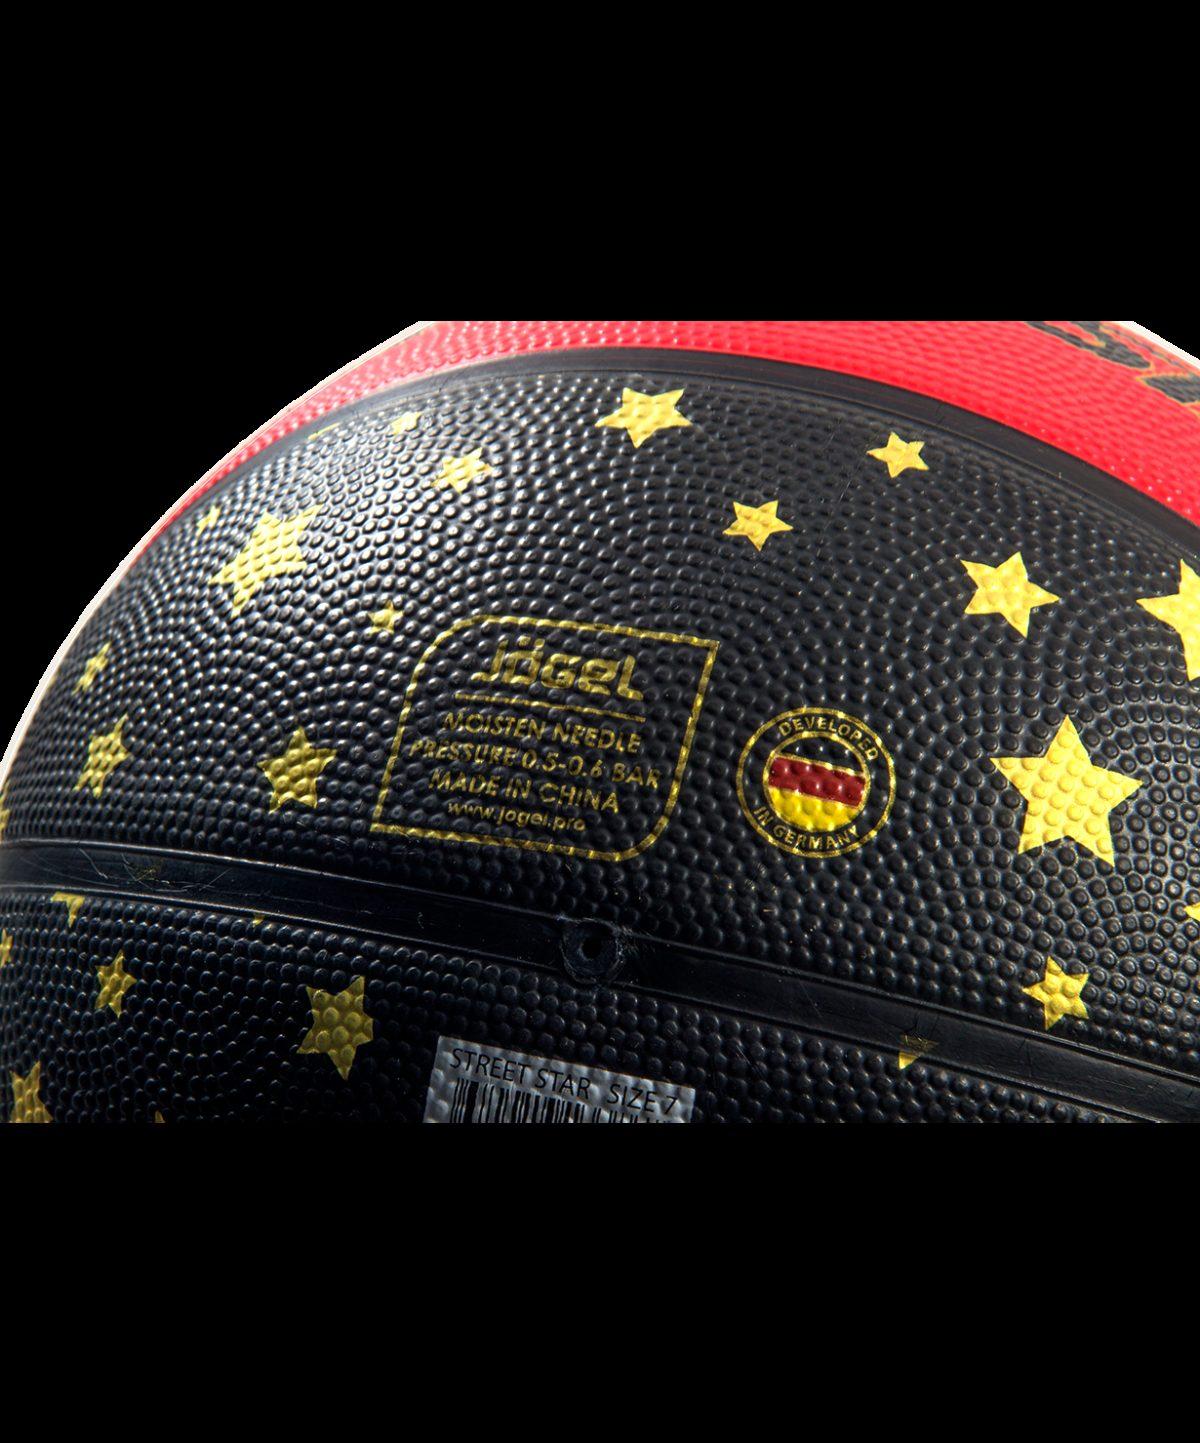 JOGEL Street Star Мяч баскетбольный  SS/7-20 №7 - 4